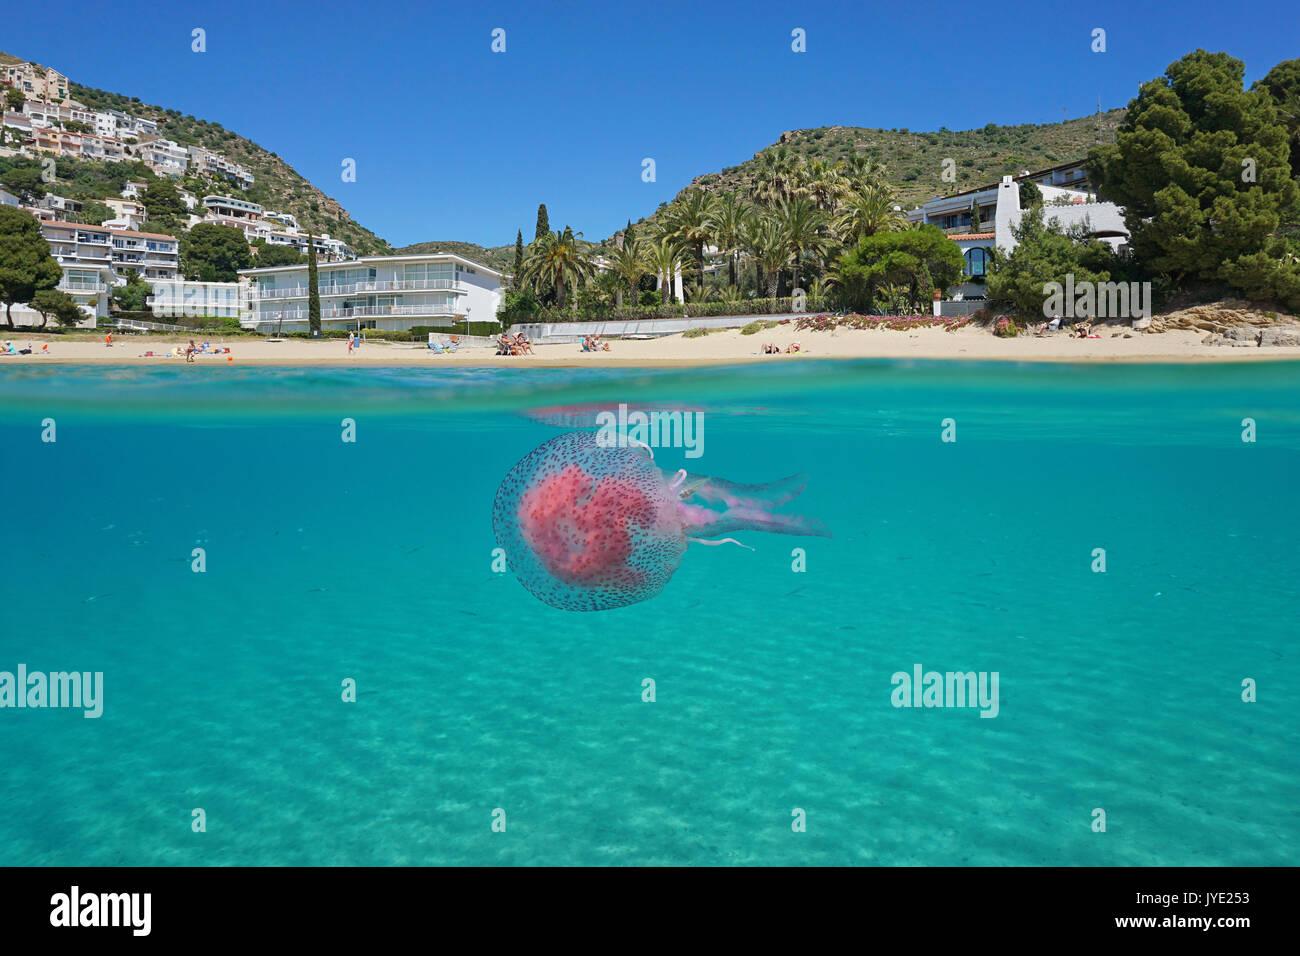 Over and under sea surface near a Mediterranean beach with a jellyfish underwater, Spain, Costa Brava, playa Almadrava, Roses, Girona, Catalonia - Stock Image